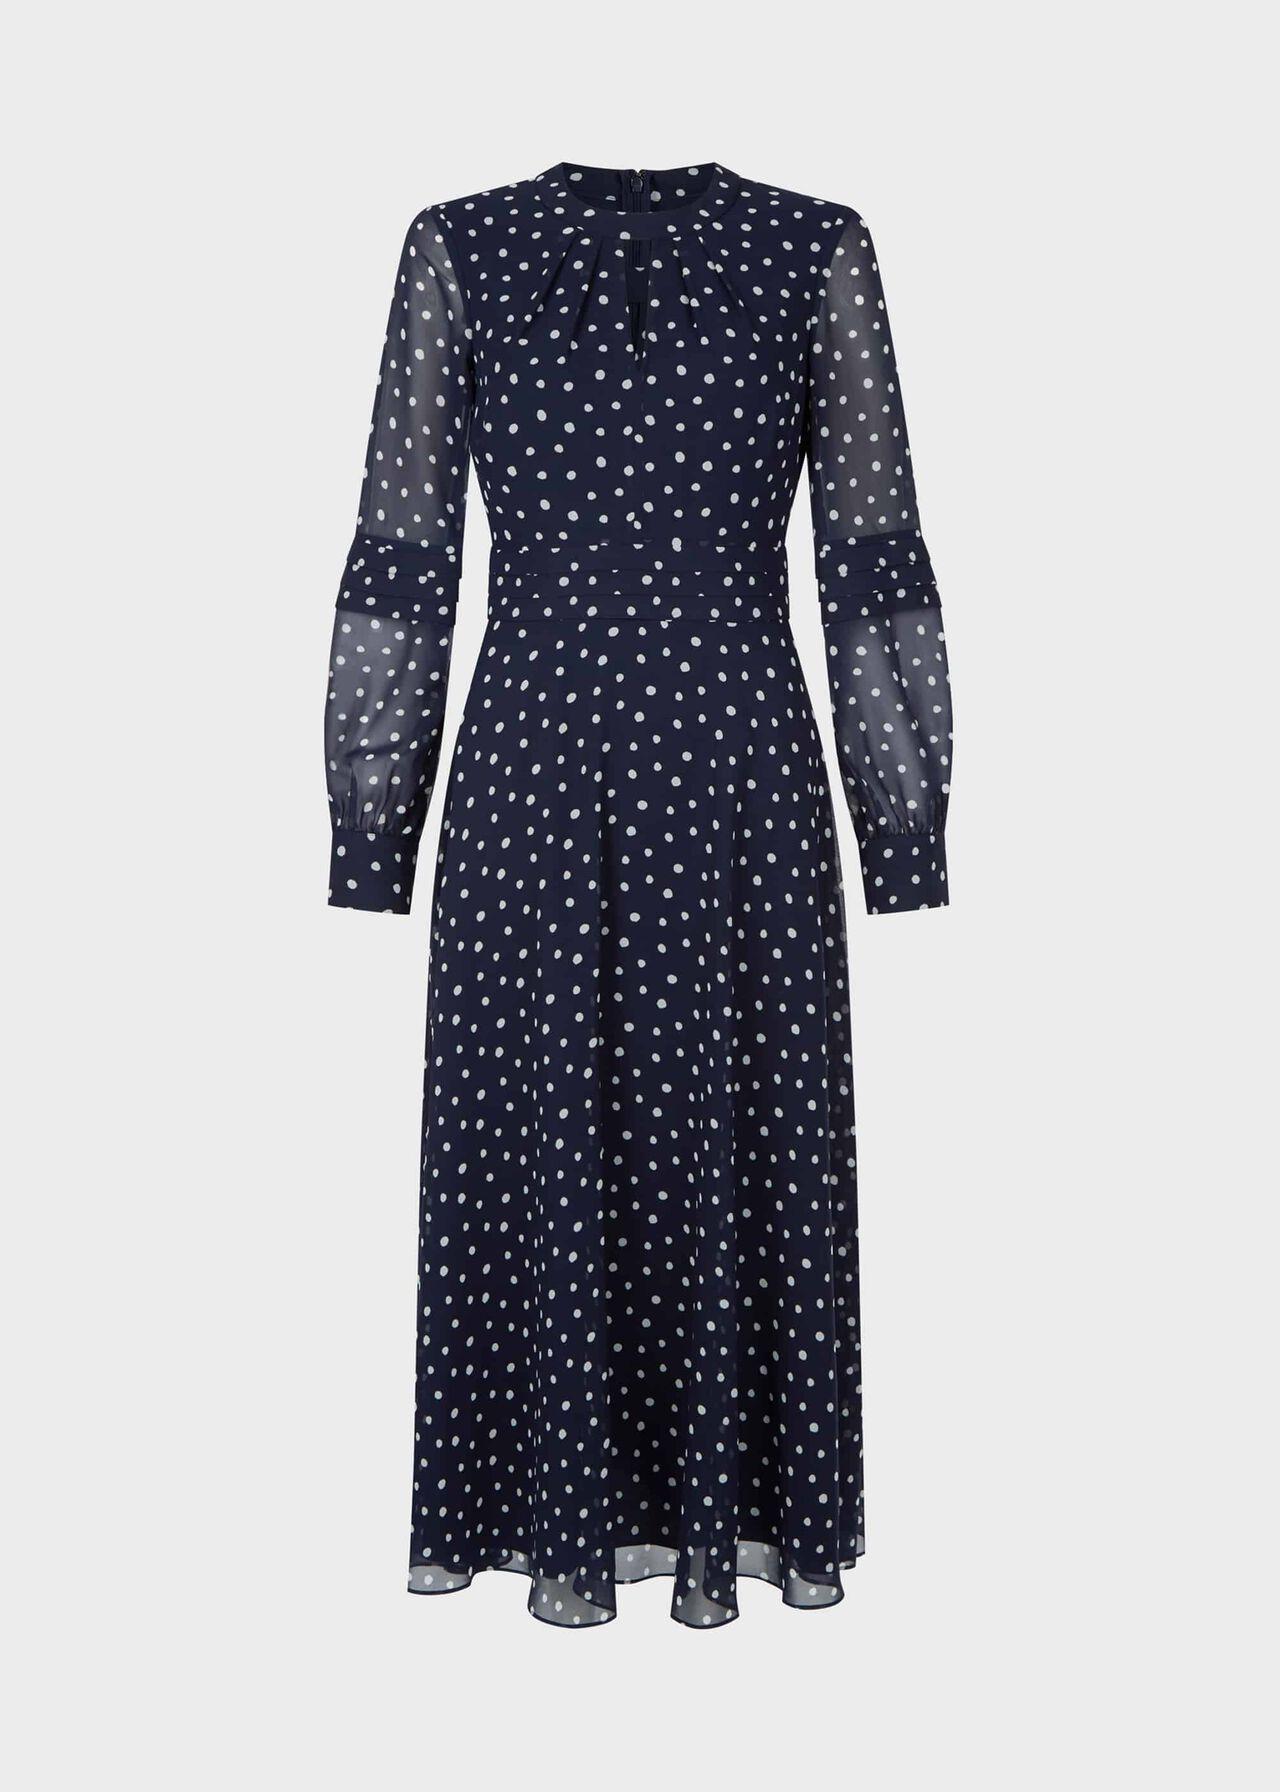 Piper Dress Midnight Ivory